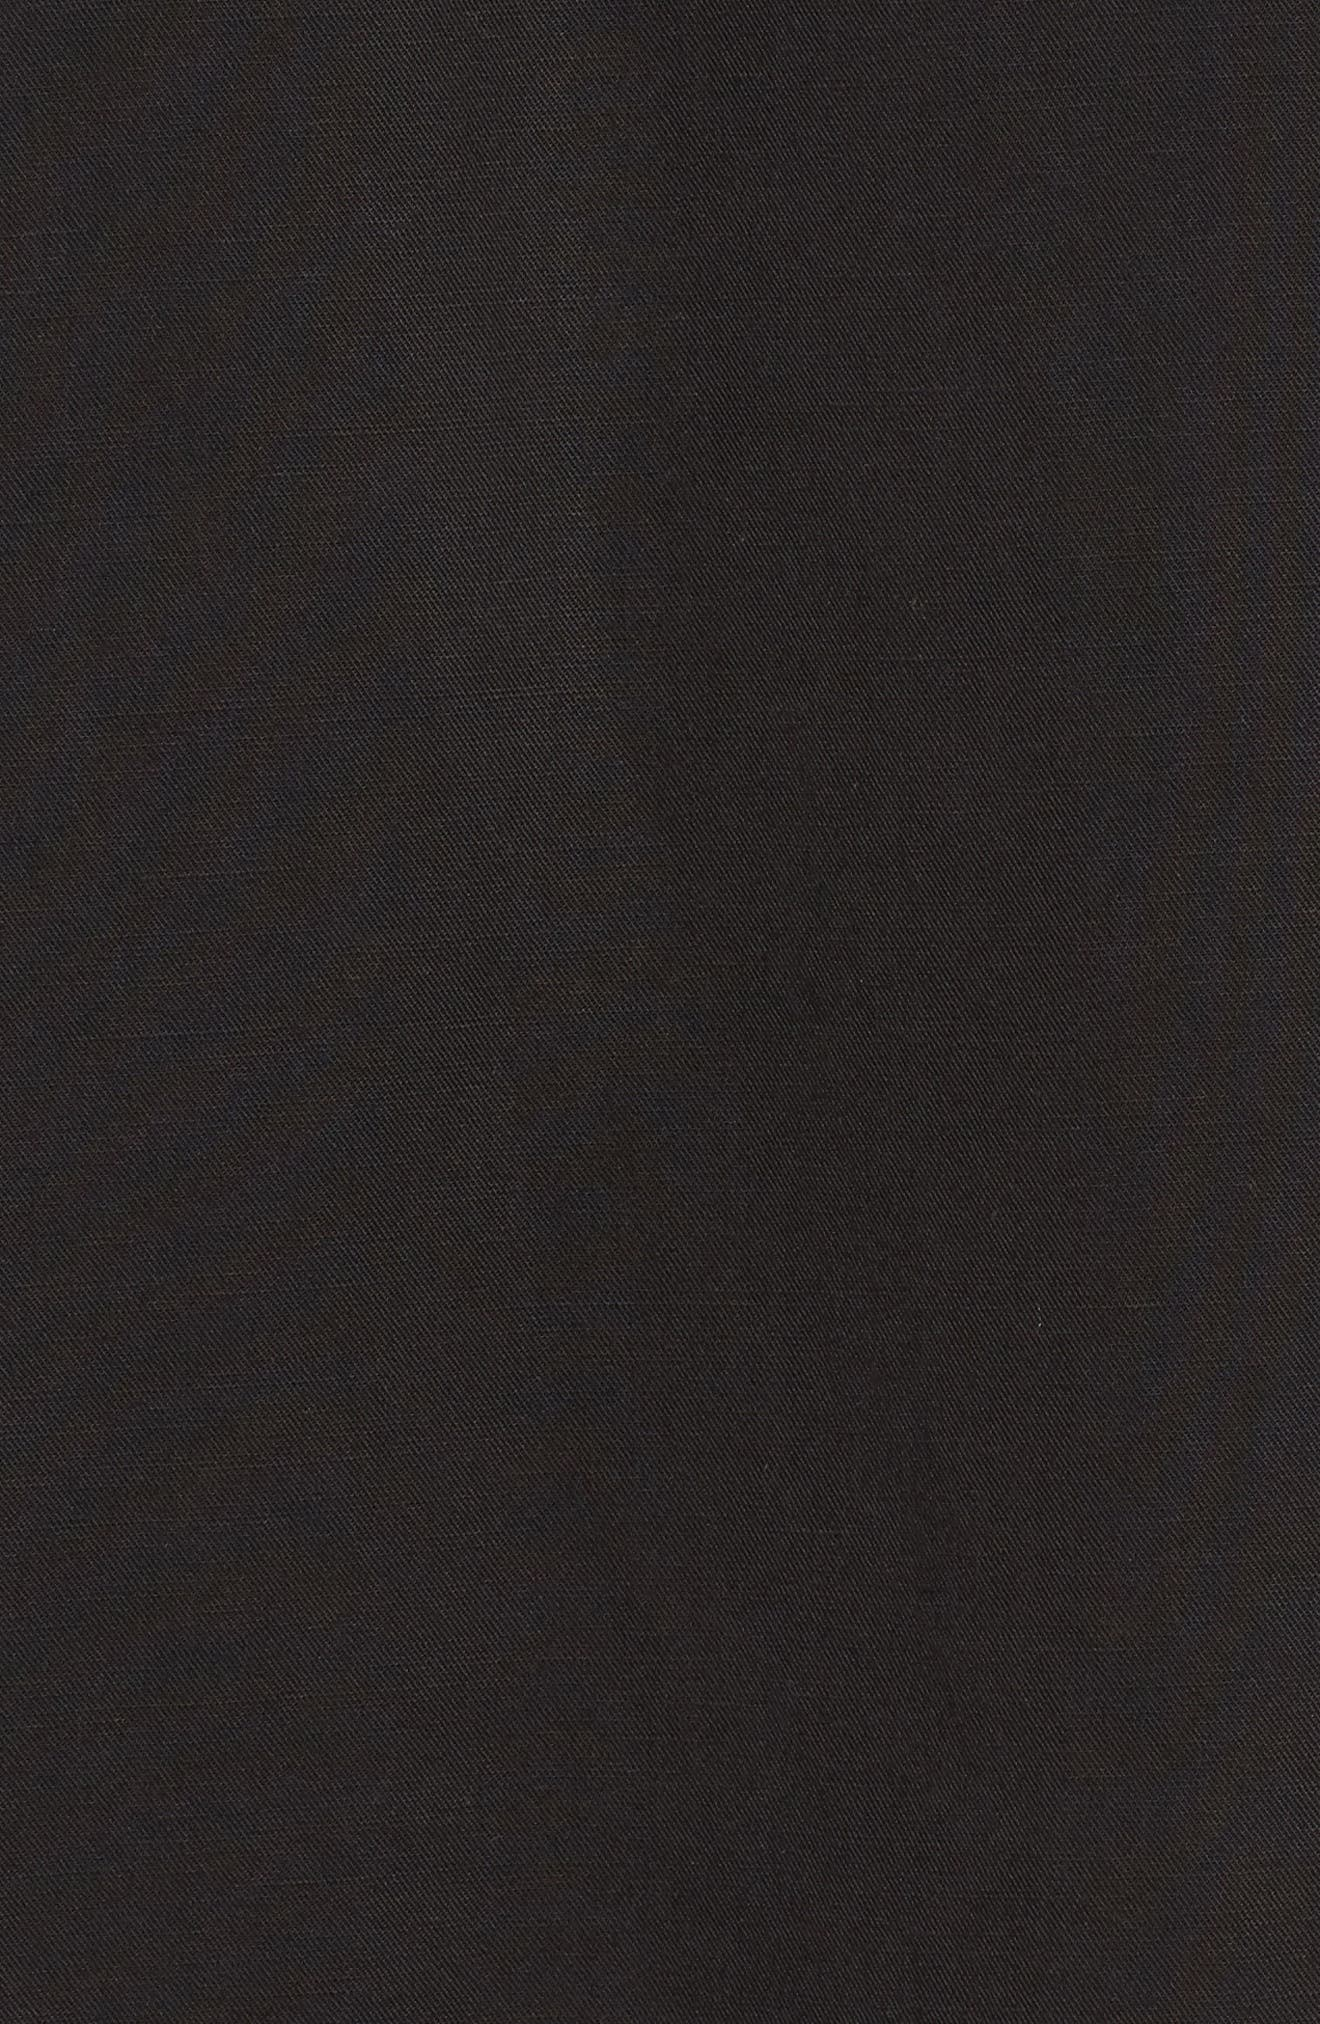 Tencel<sup>®</sup> Lyocell & Linen Midi Skirt,                             Alternate thumbnail 5, color,                             001